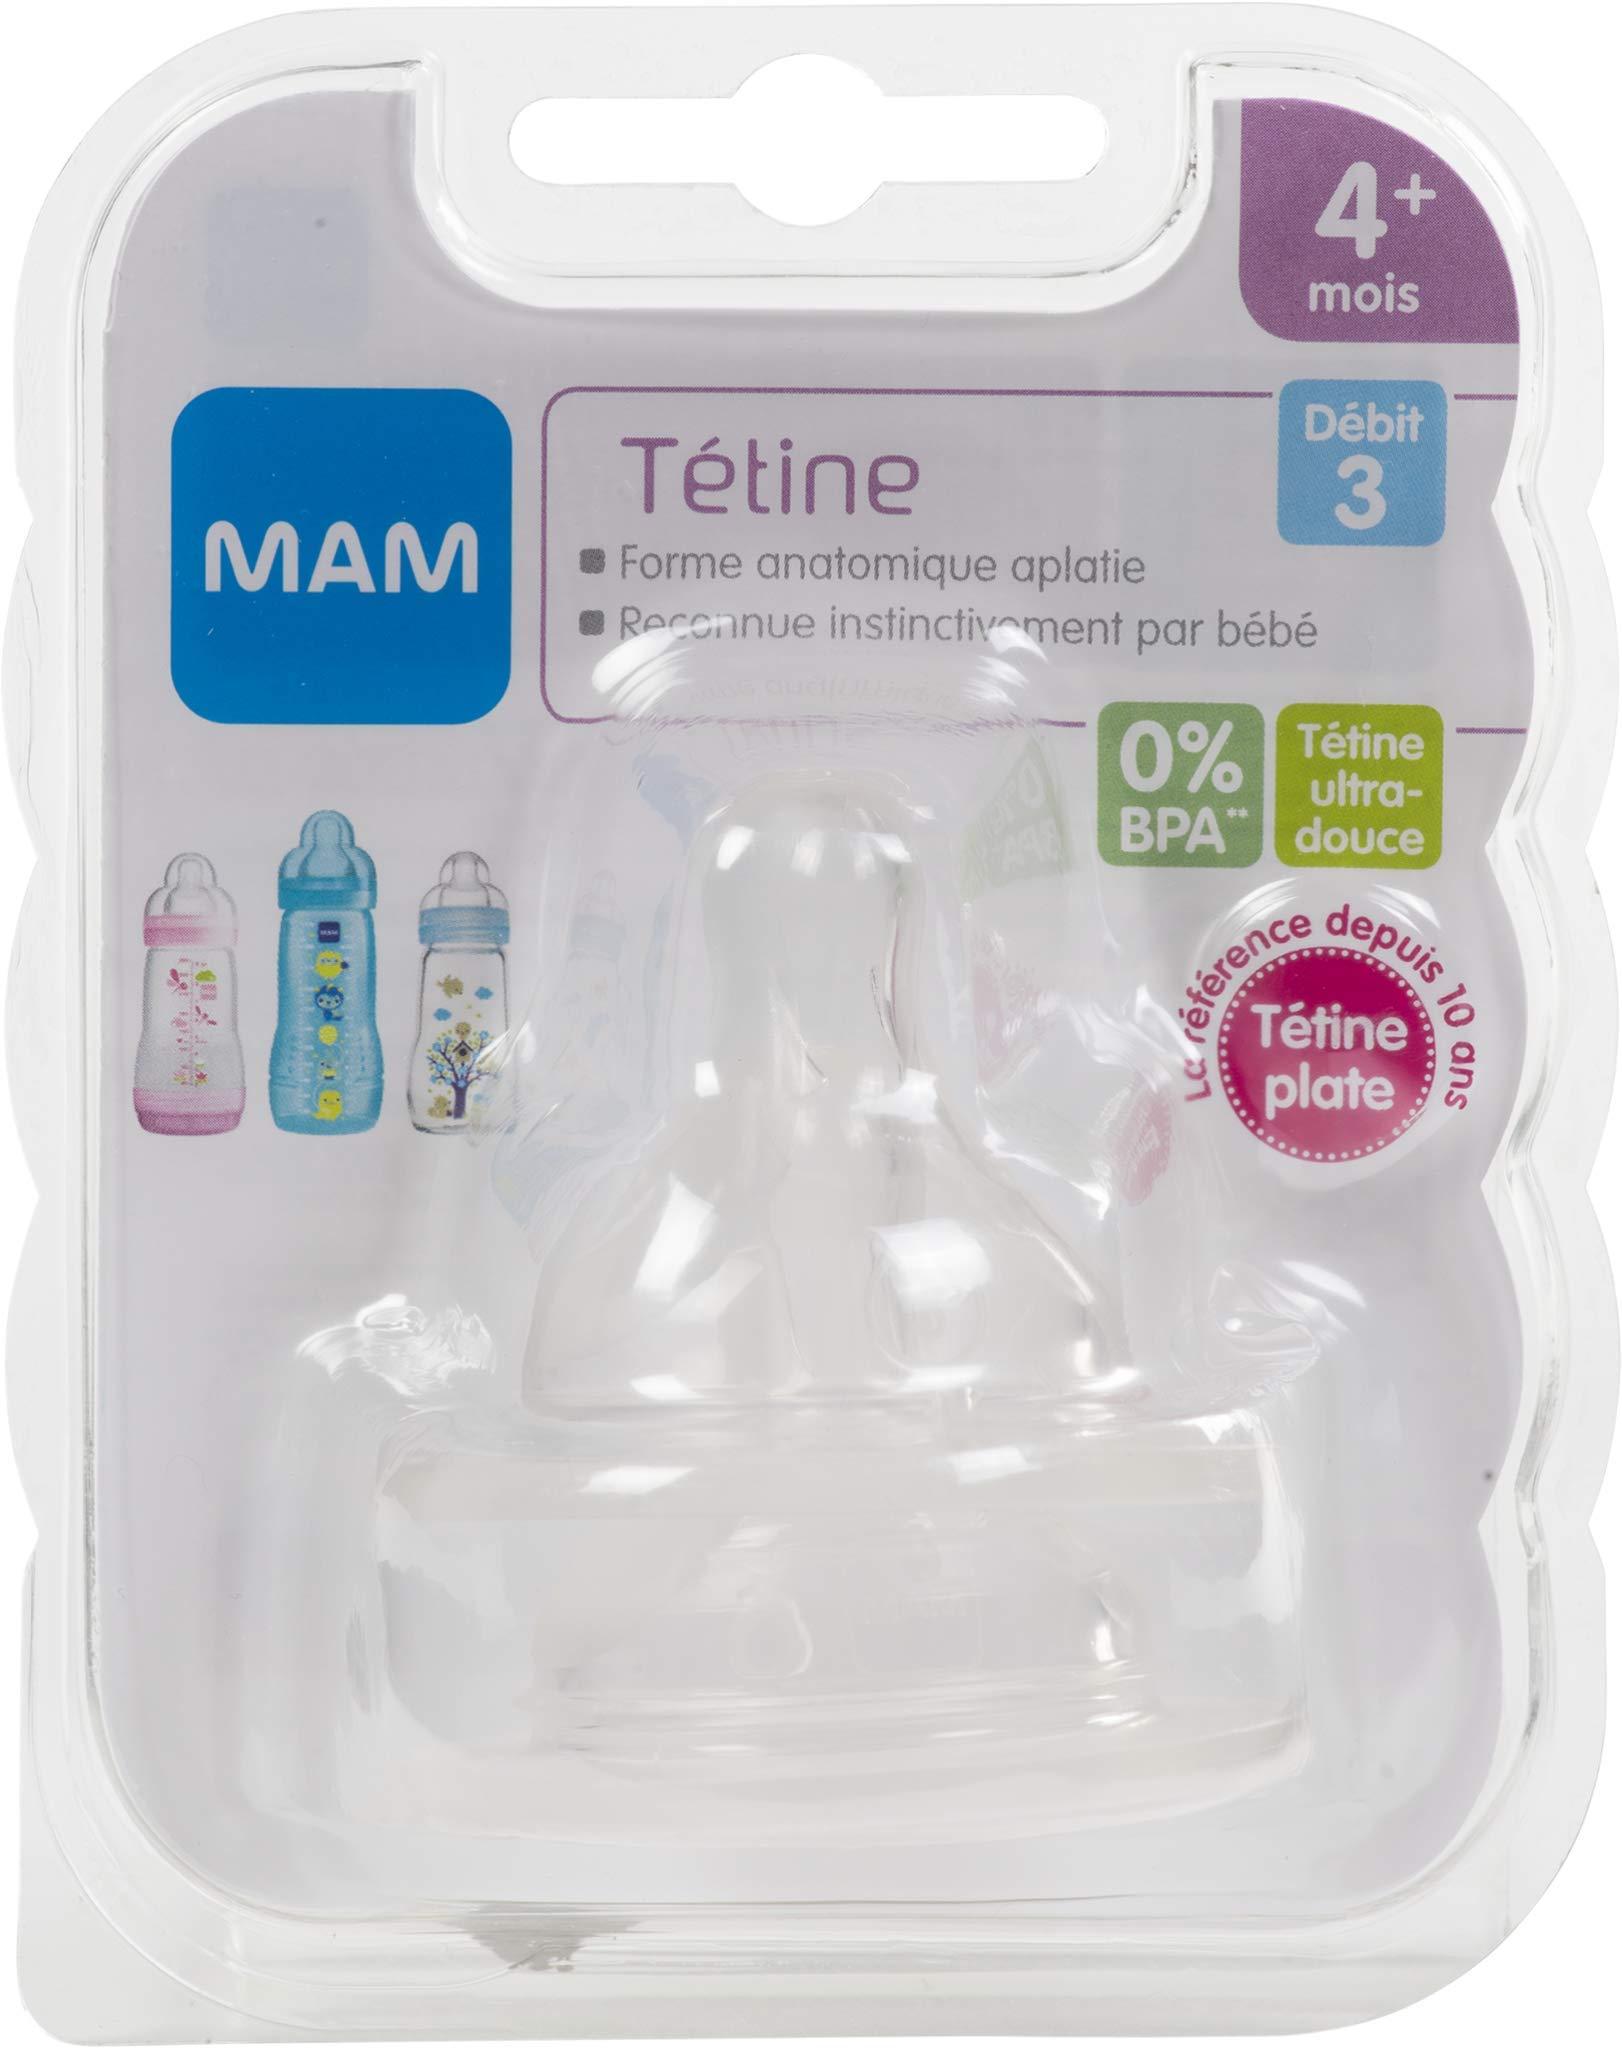 MAM Babyartikel - Tetinas para biberón (2 unidades) product image